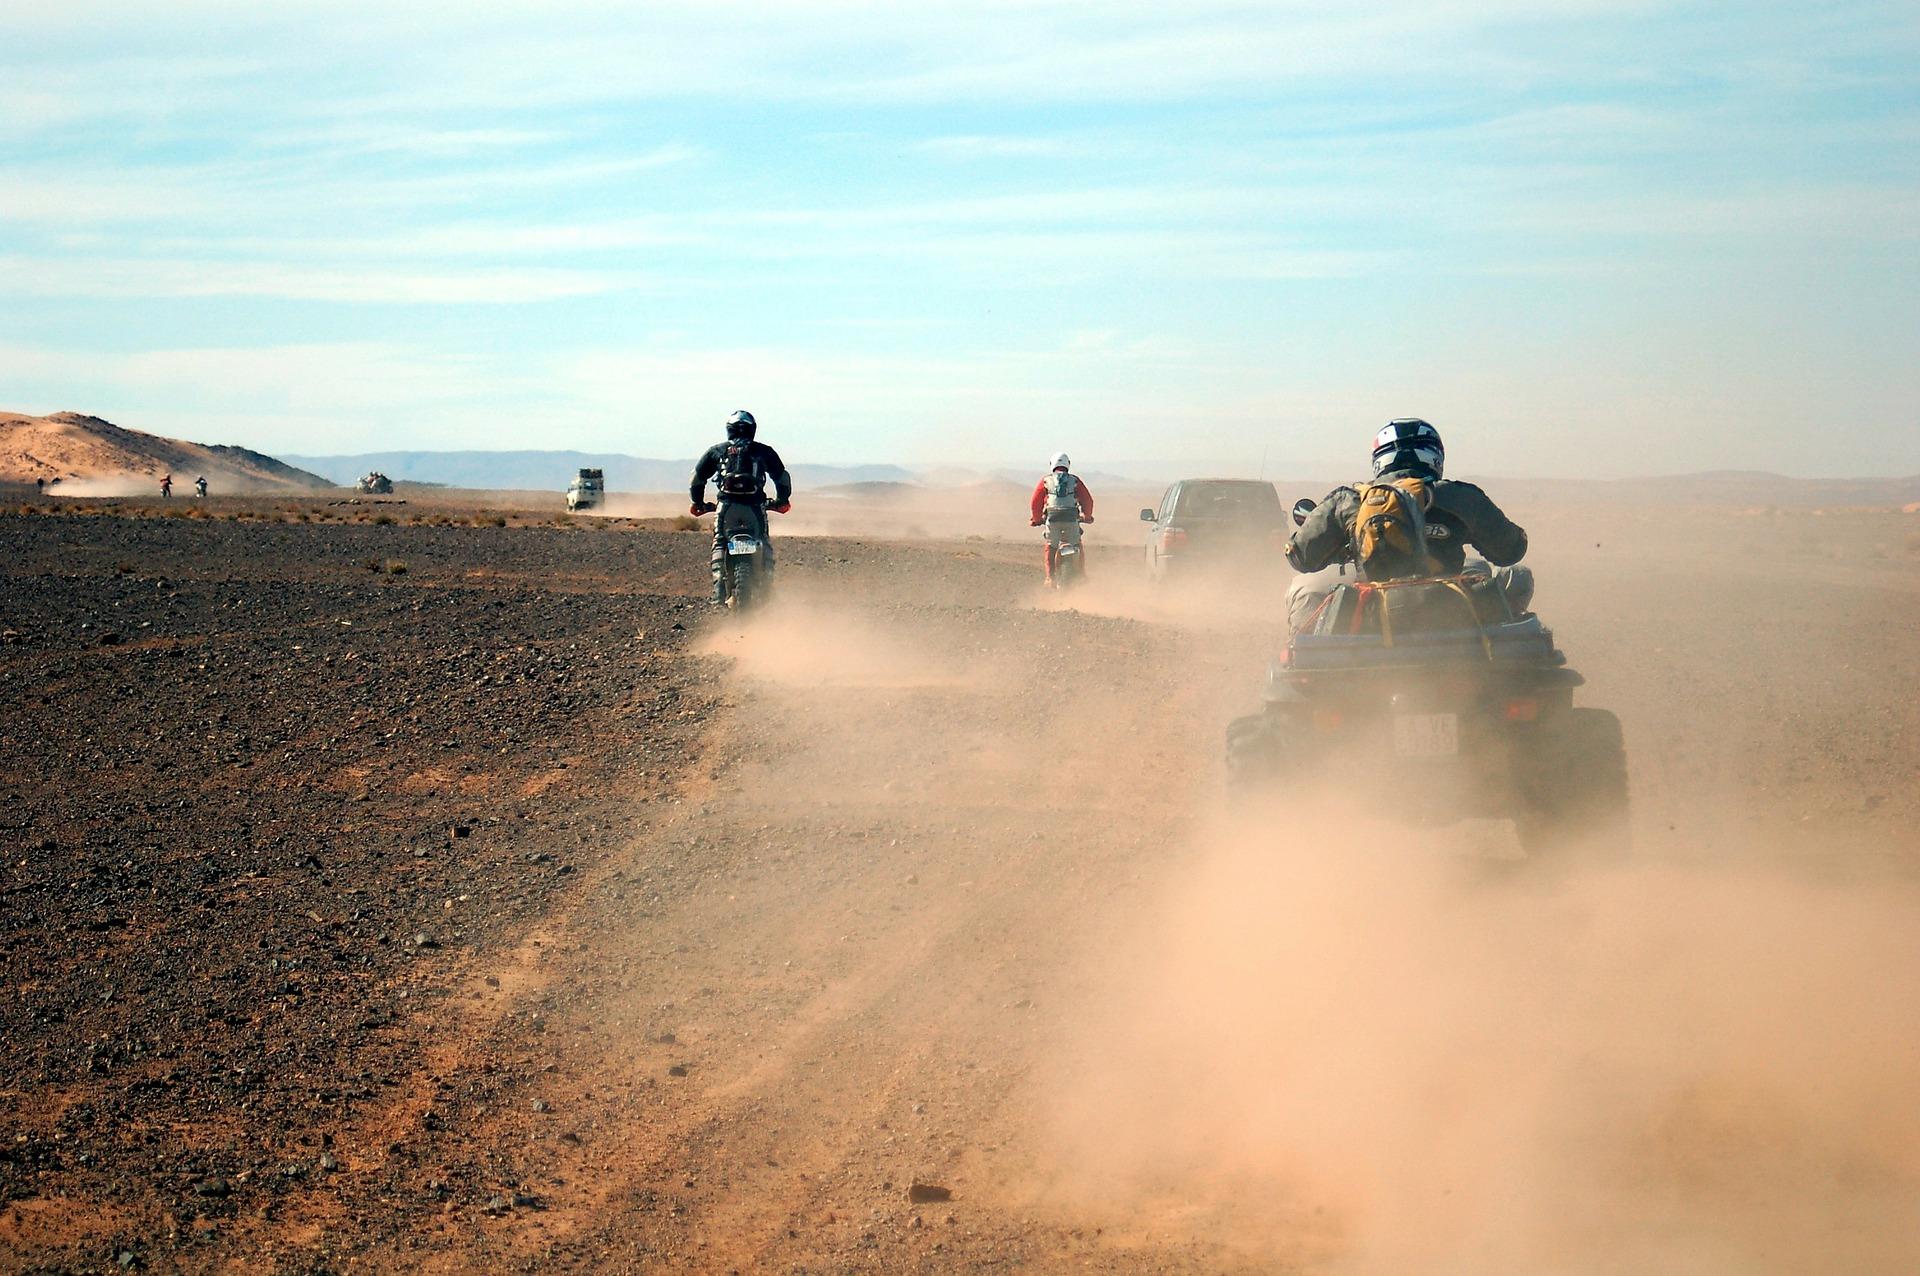 ATVs in Morocco